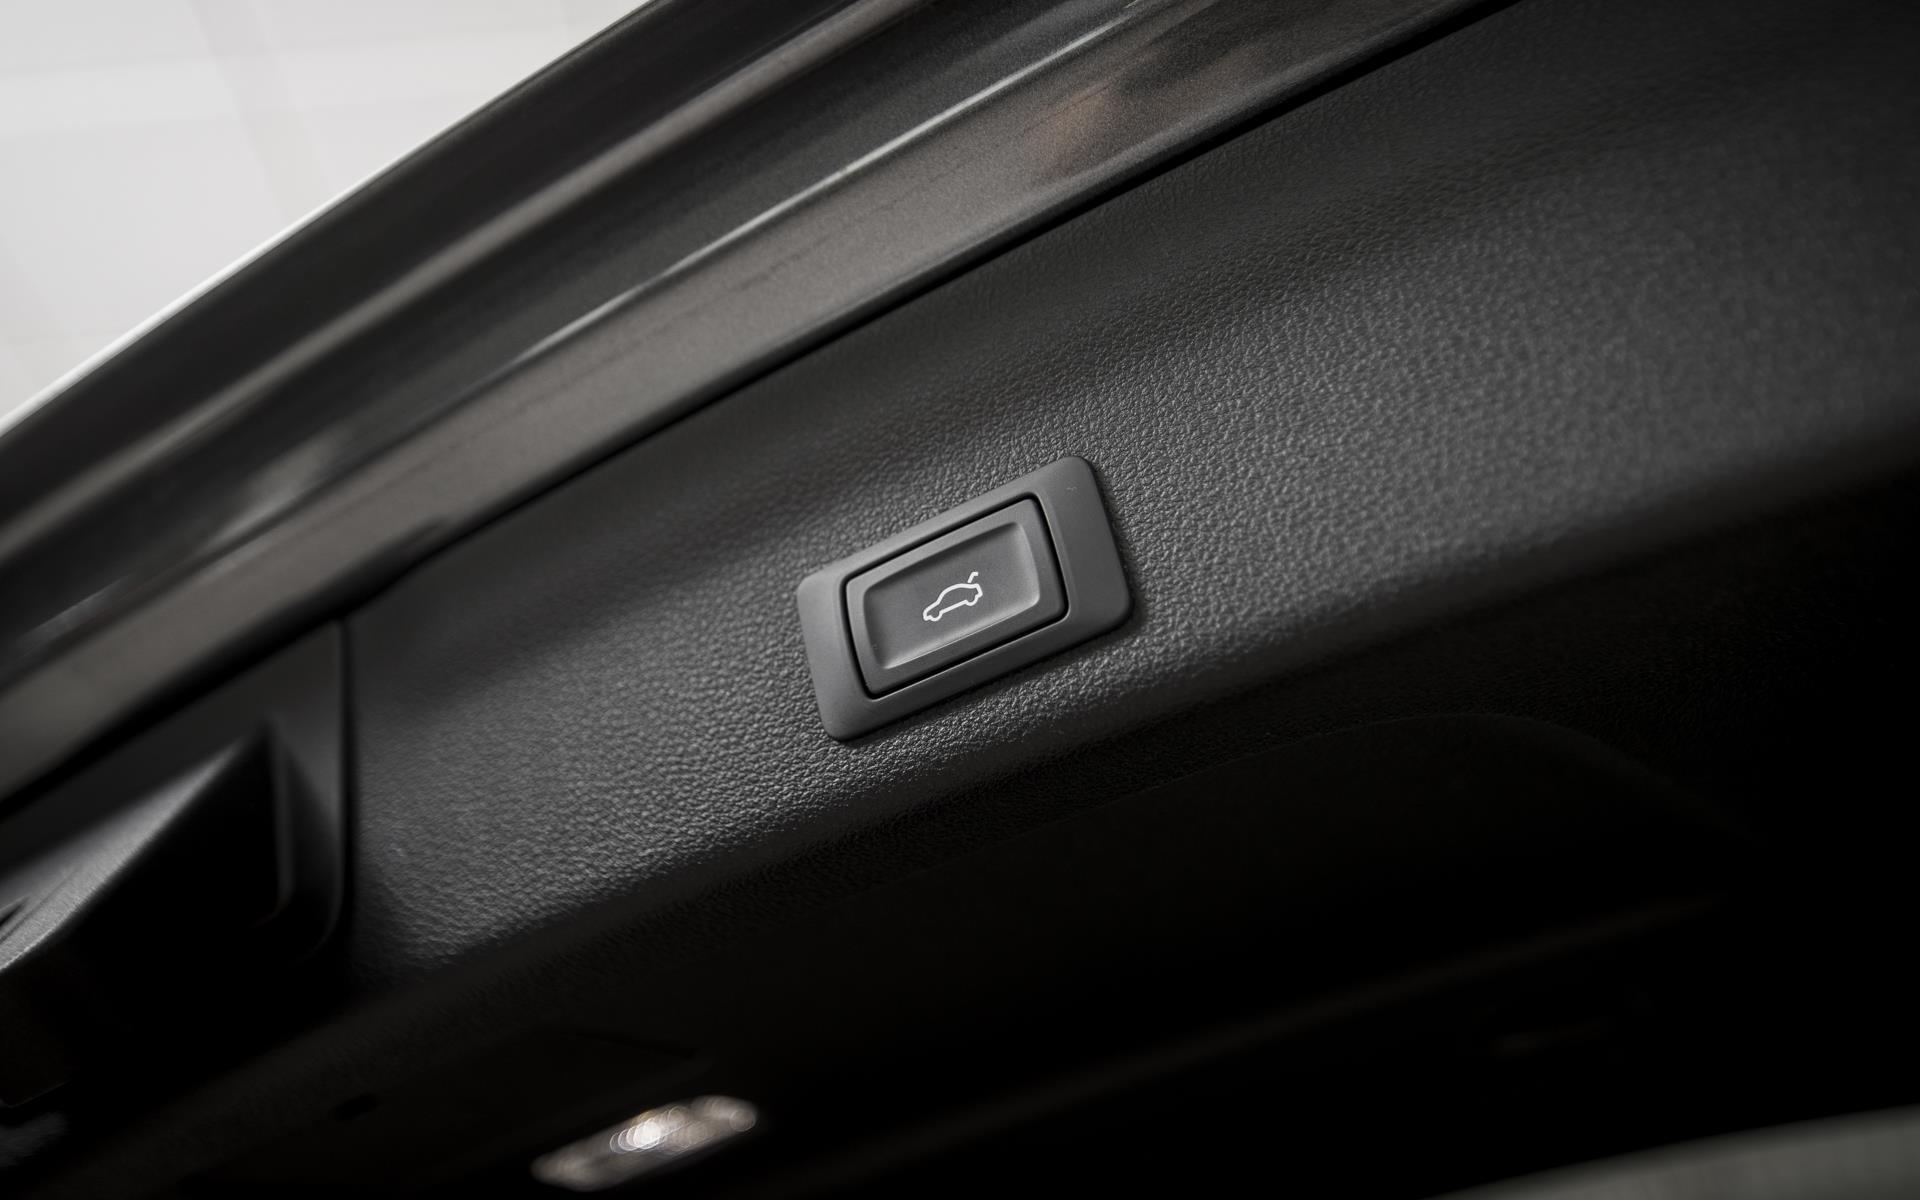 45 Avant 3,0 TDI S Line Quattro Tiptronic 231HK Stc  image23